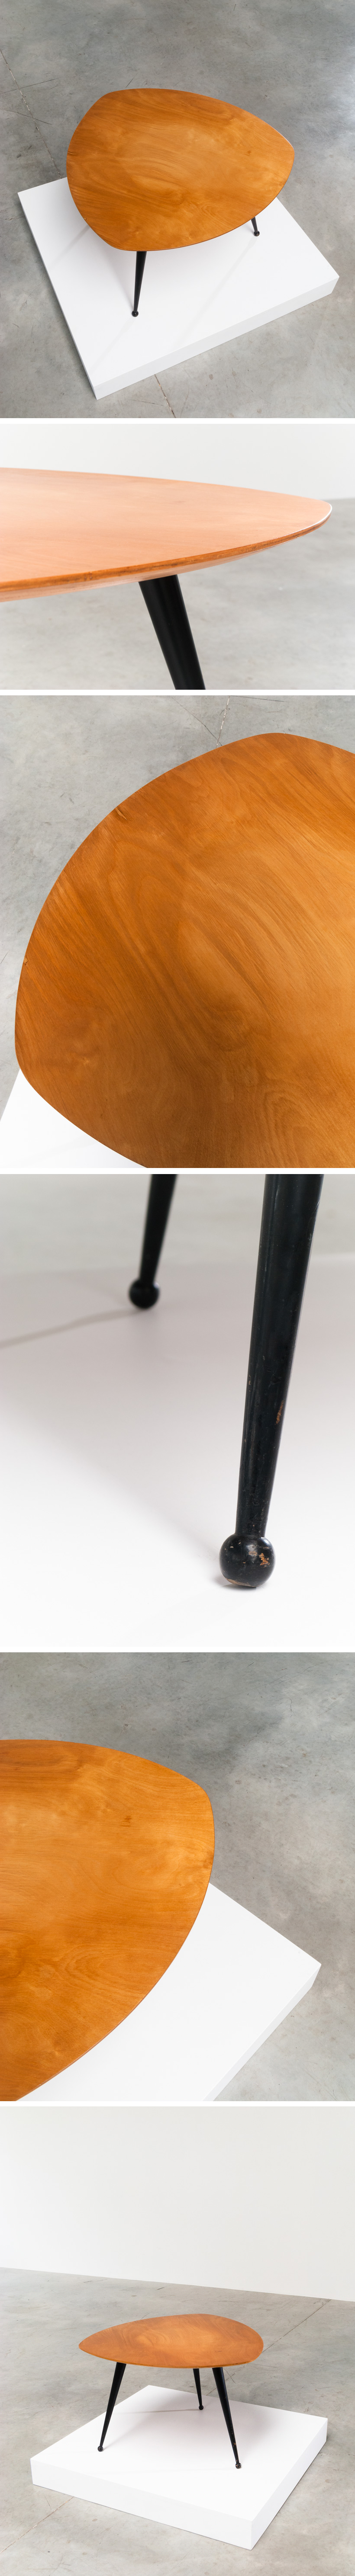 Cees Braakman Kidney shaped side table TB16 Pastoe Large